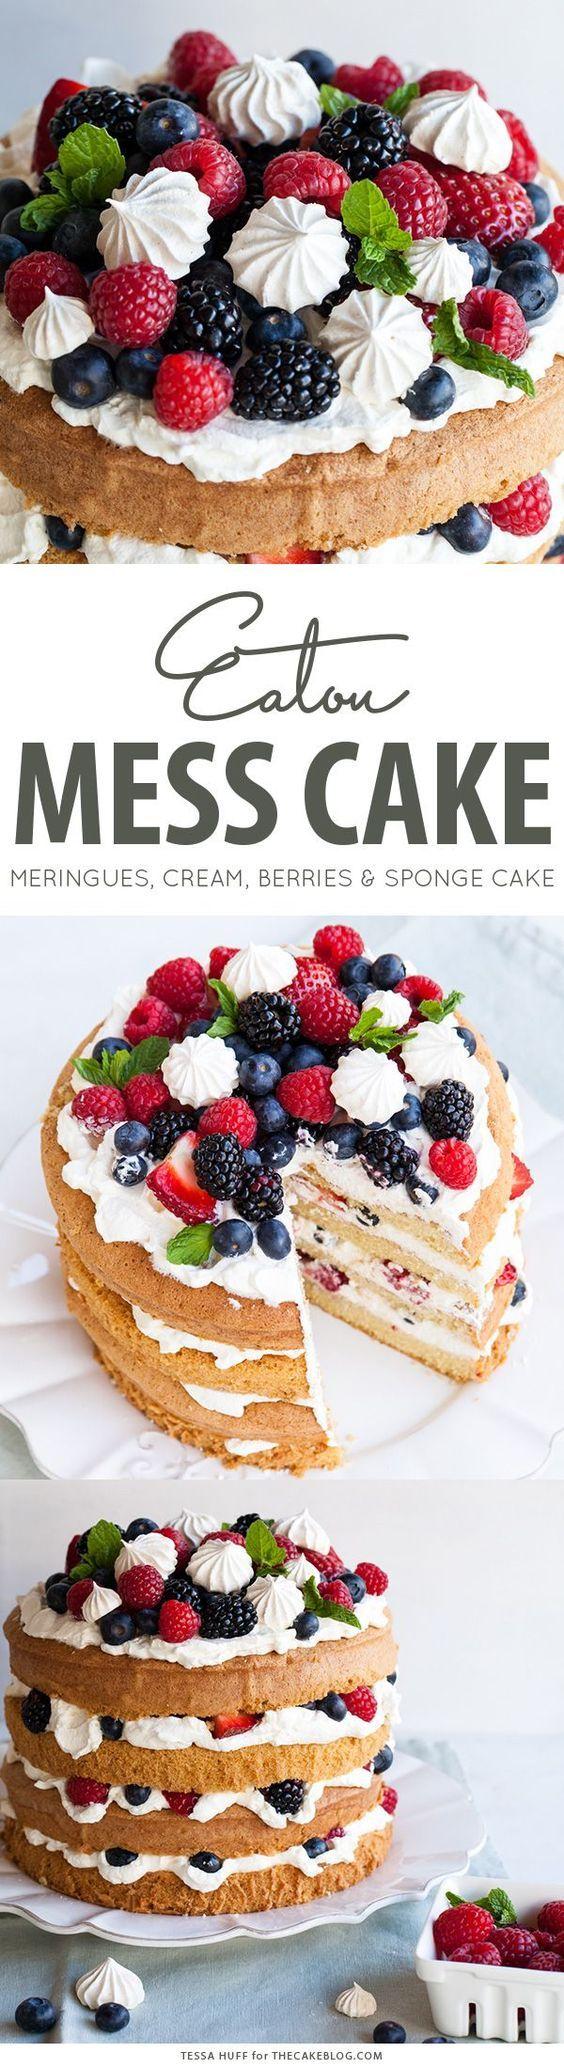 Inspired by the classic dessert, this Eaton Mess Cake combines crisp meringues, sweetened cream, fresh berries. Perfect summer dessert!